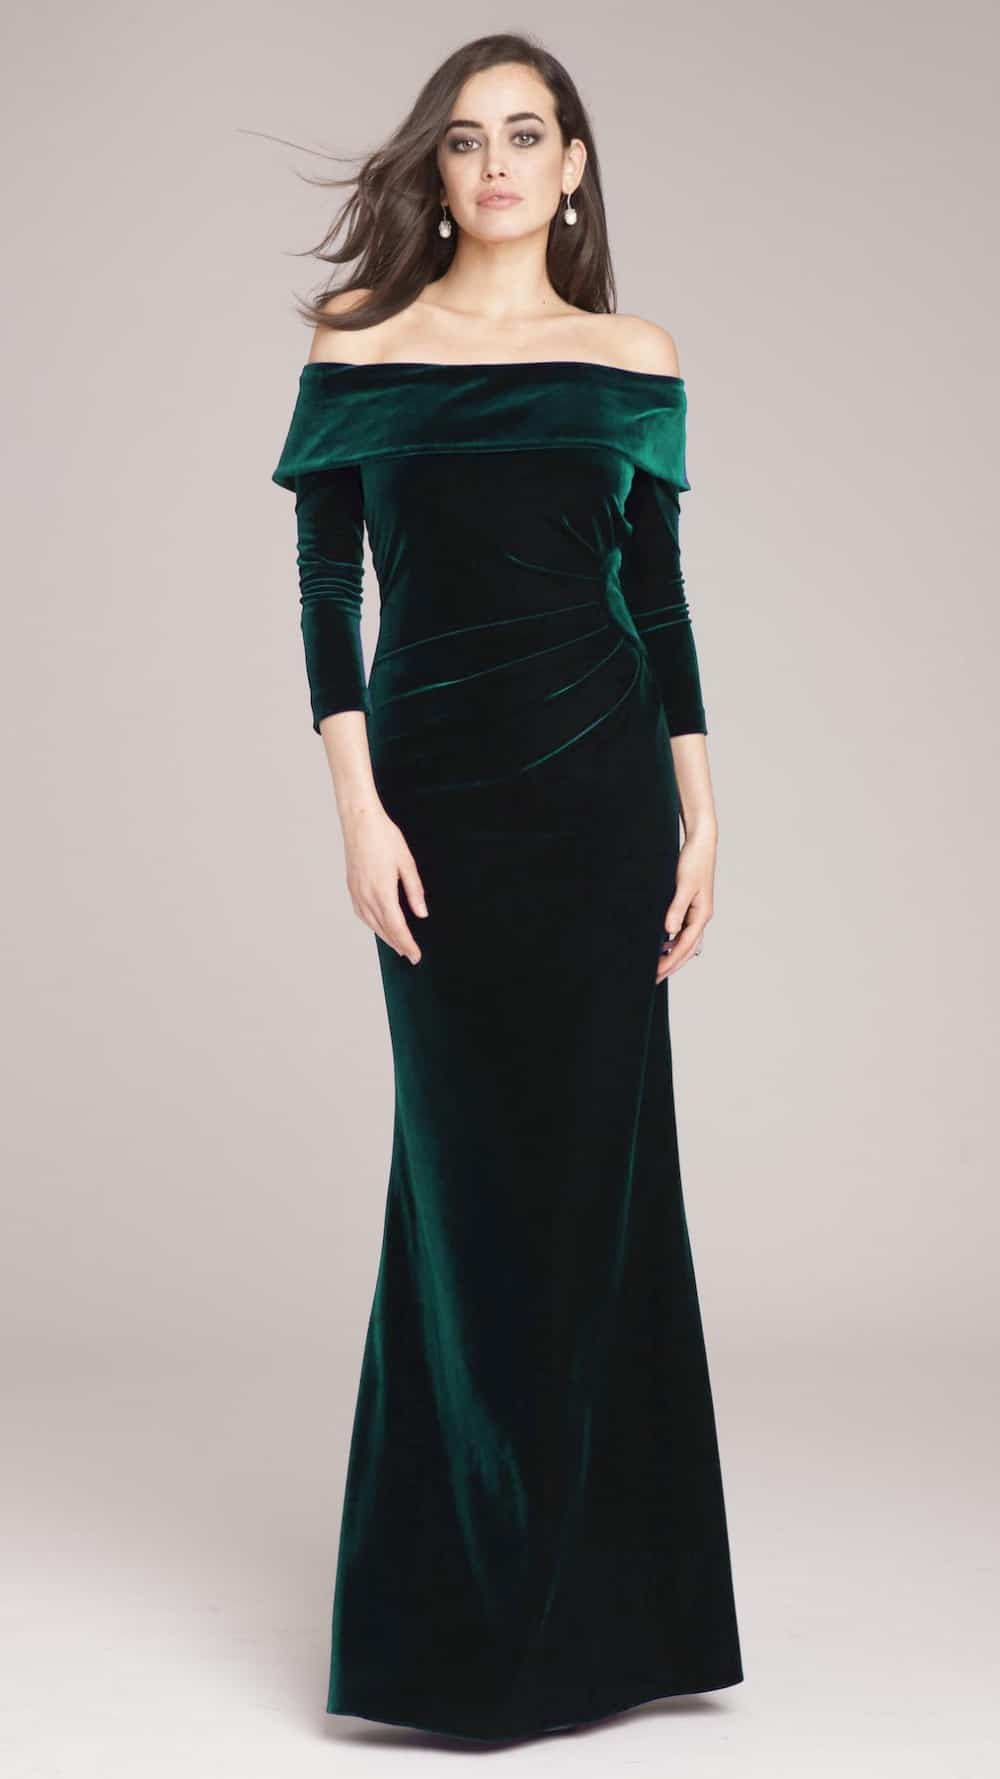 Off the Shoulder Emerald Green Velvet Gown   Dress for the Wedding